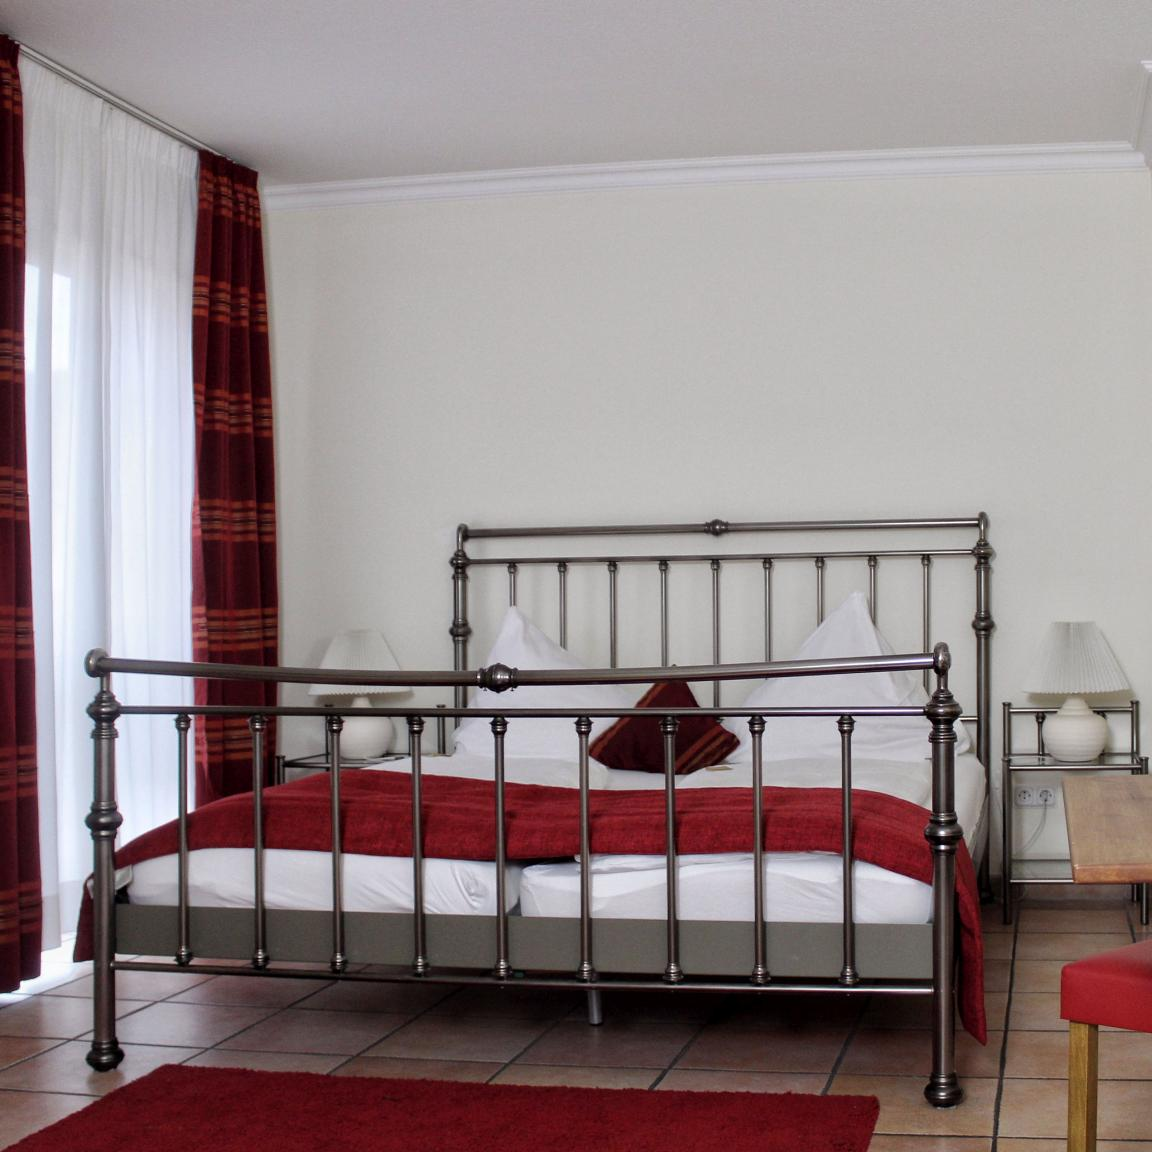 & Brauhaus Akazienhof, Pension in Köln